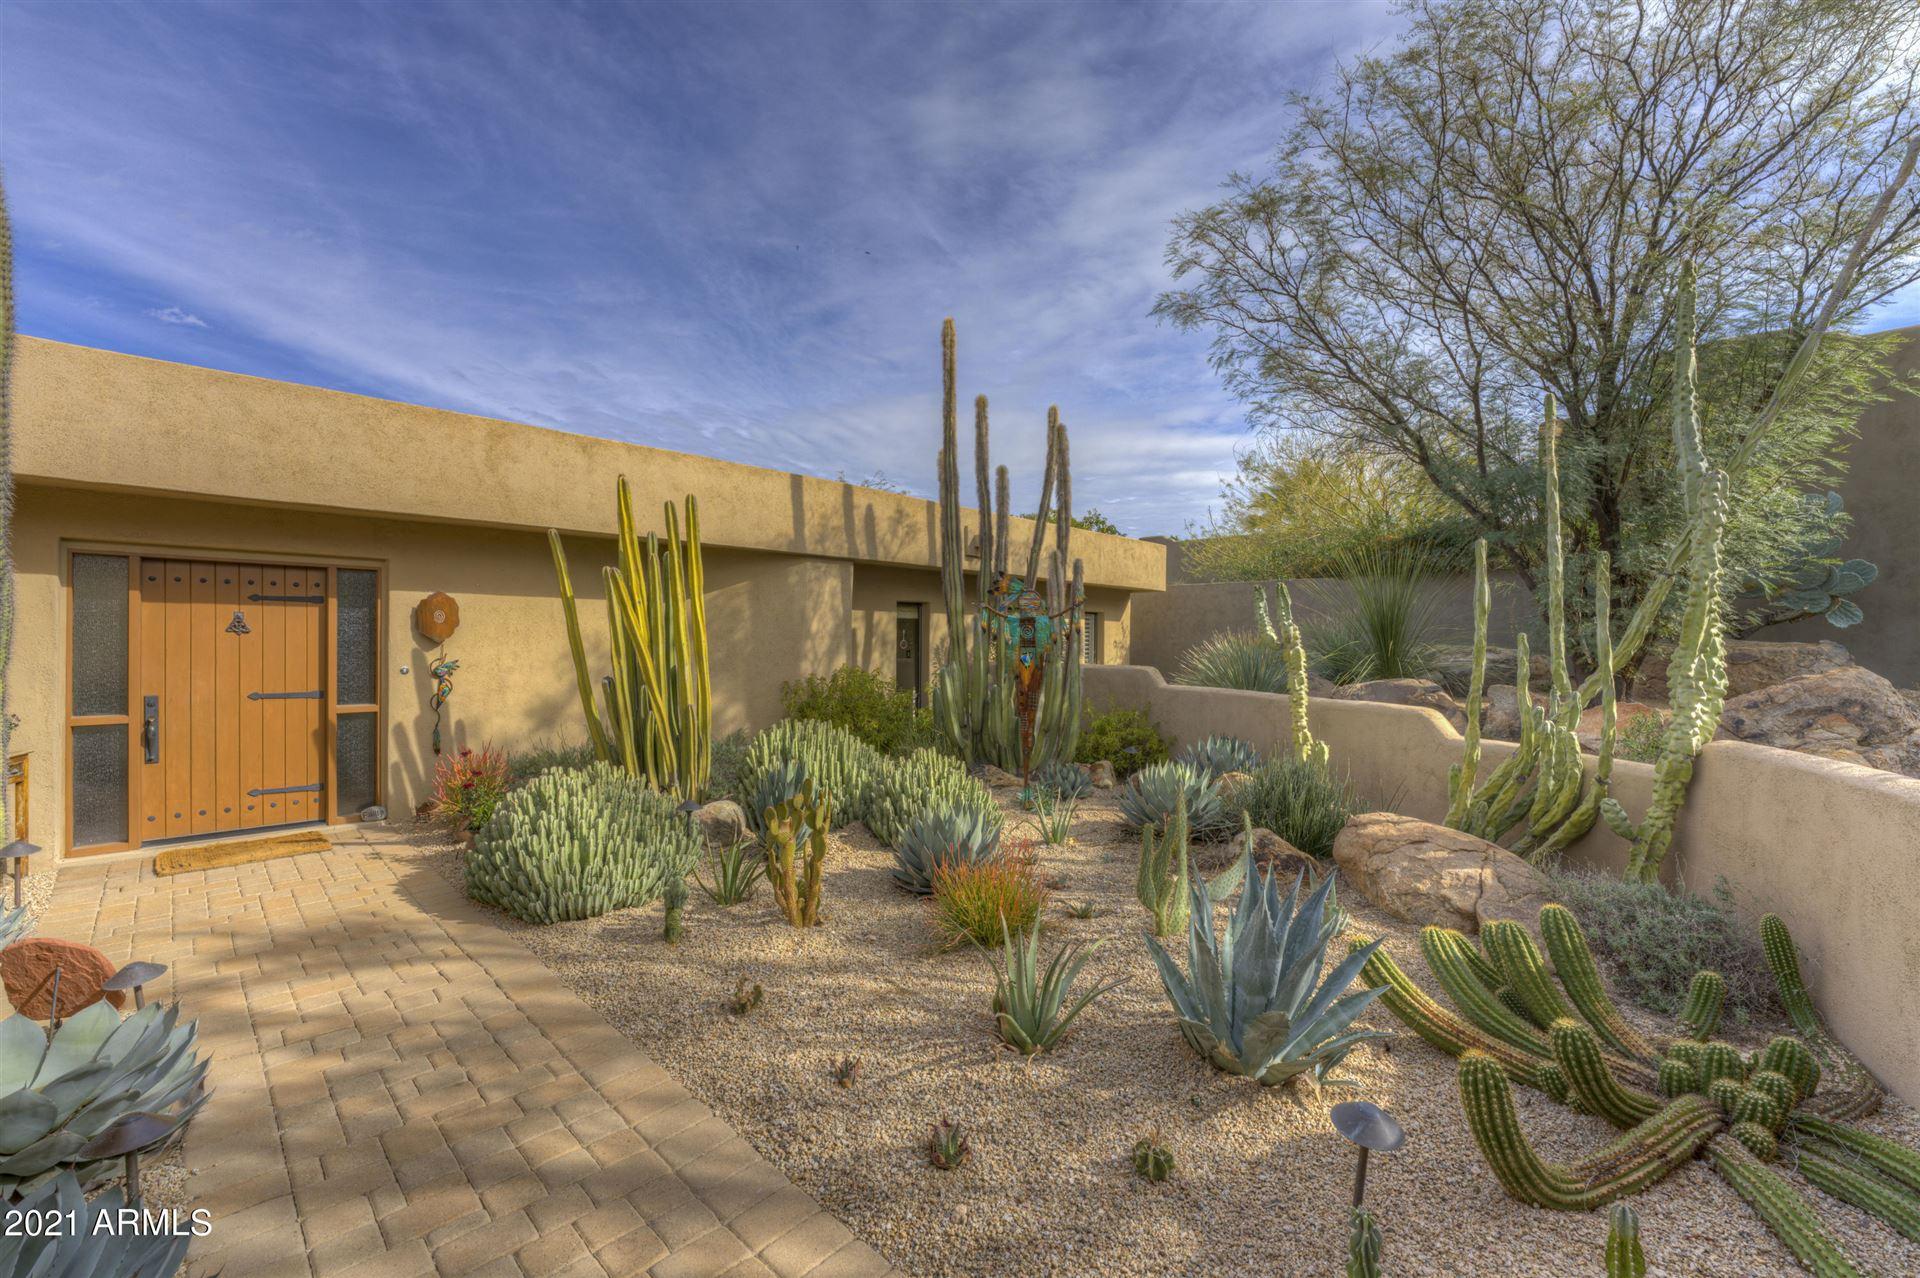 Photo of 1708 E STAGHORN Lane, Carefree, AZ 85377 (MLS # 6190316)